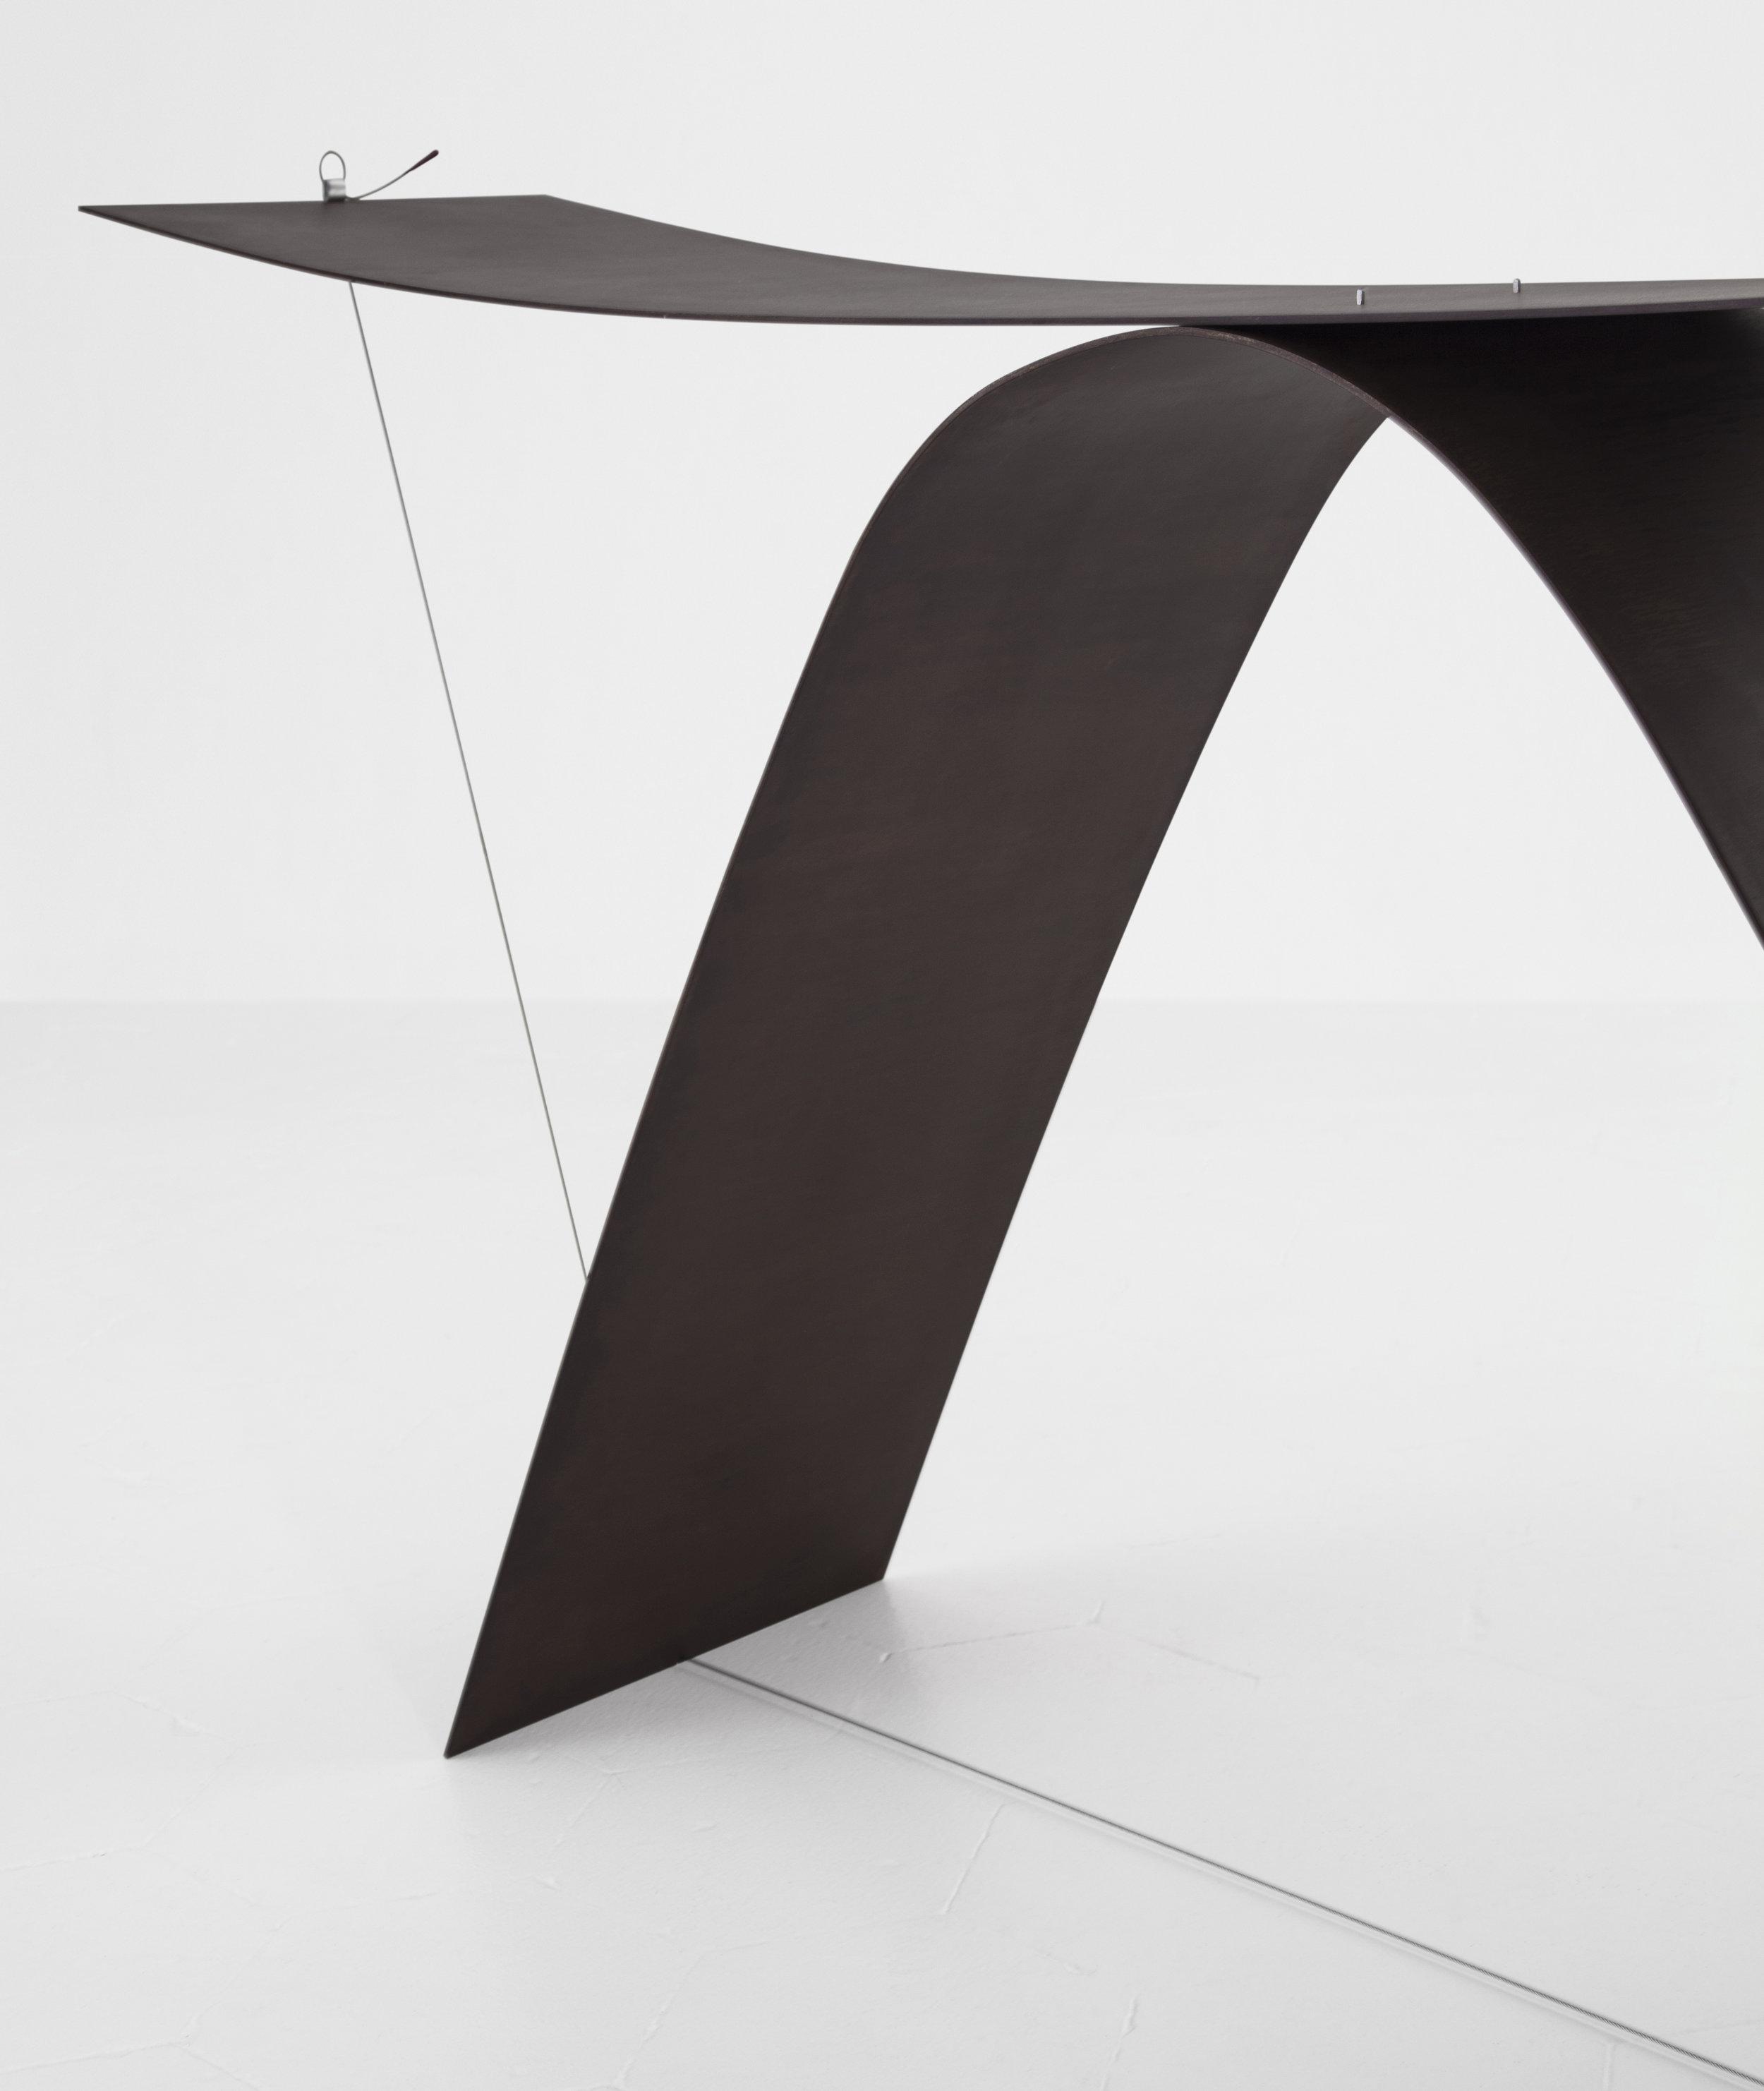 Detail of  Equilibrium  Console designed by Guglielmo Poletti ©  Giulia Piermartiri